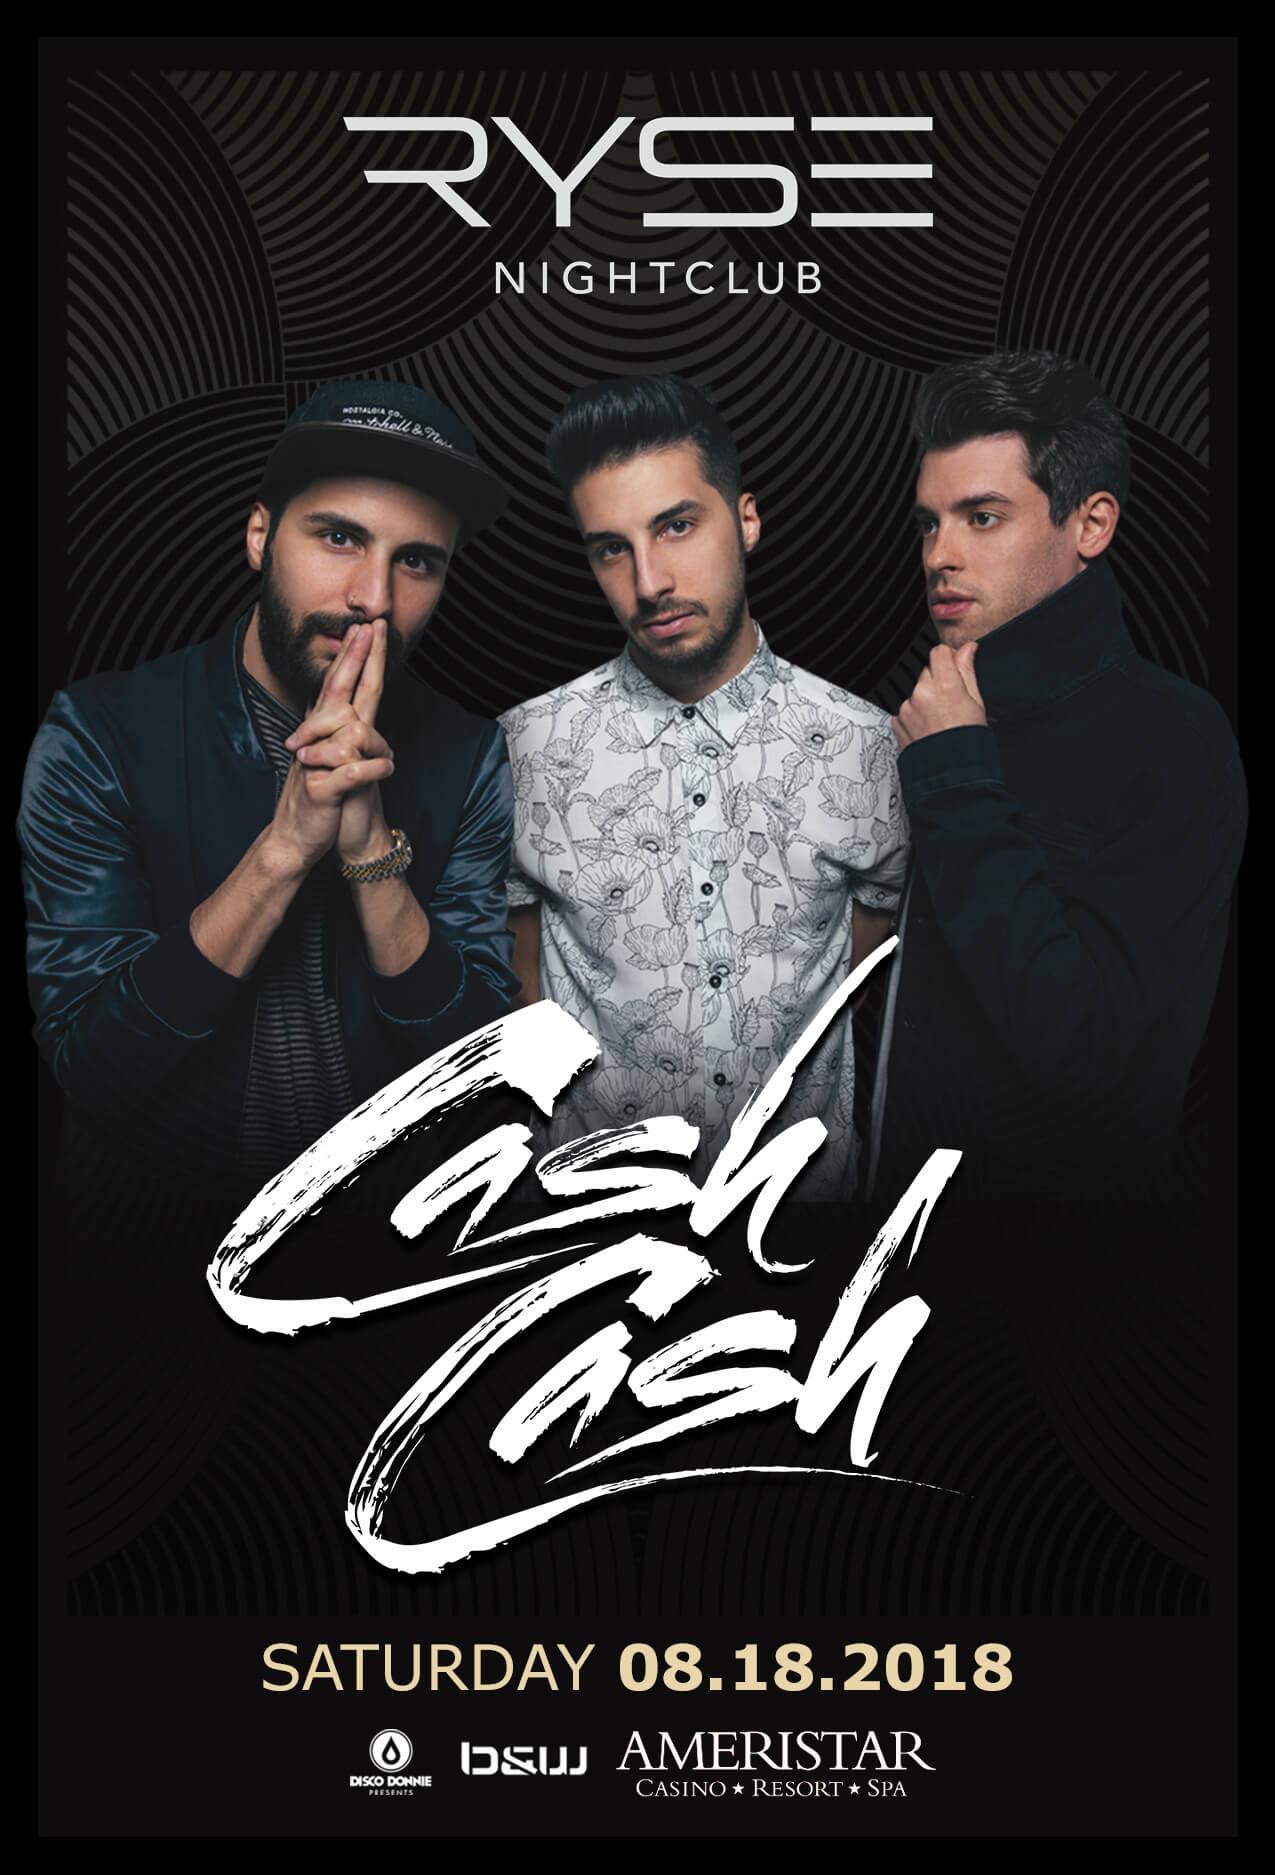 Cash Cash in St Charles